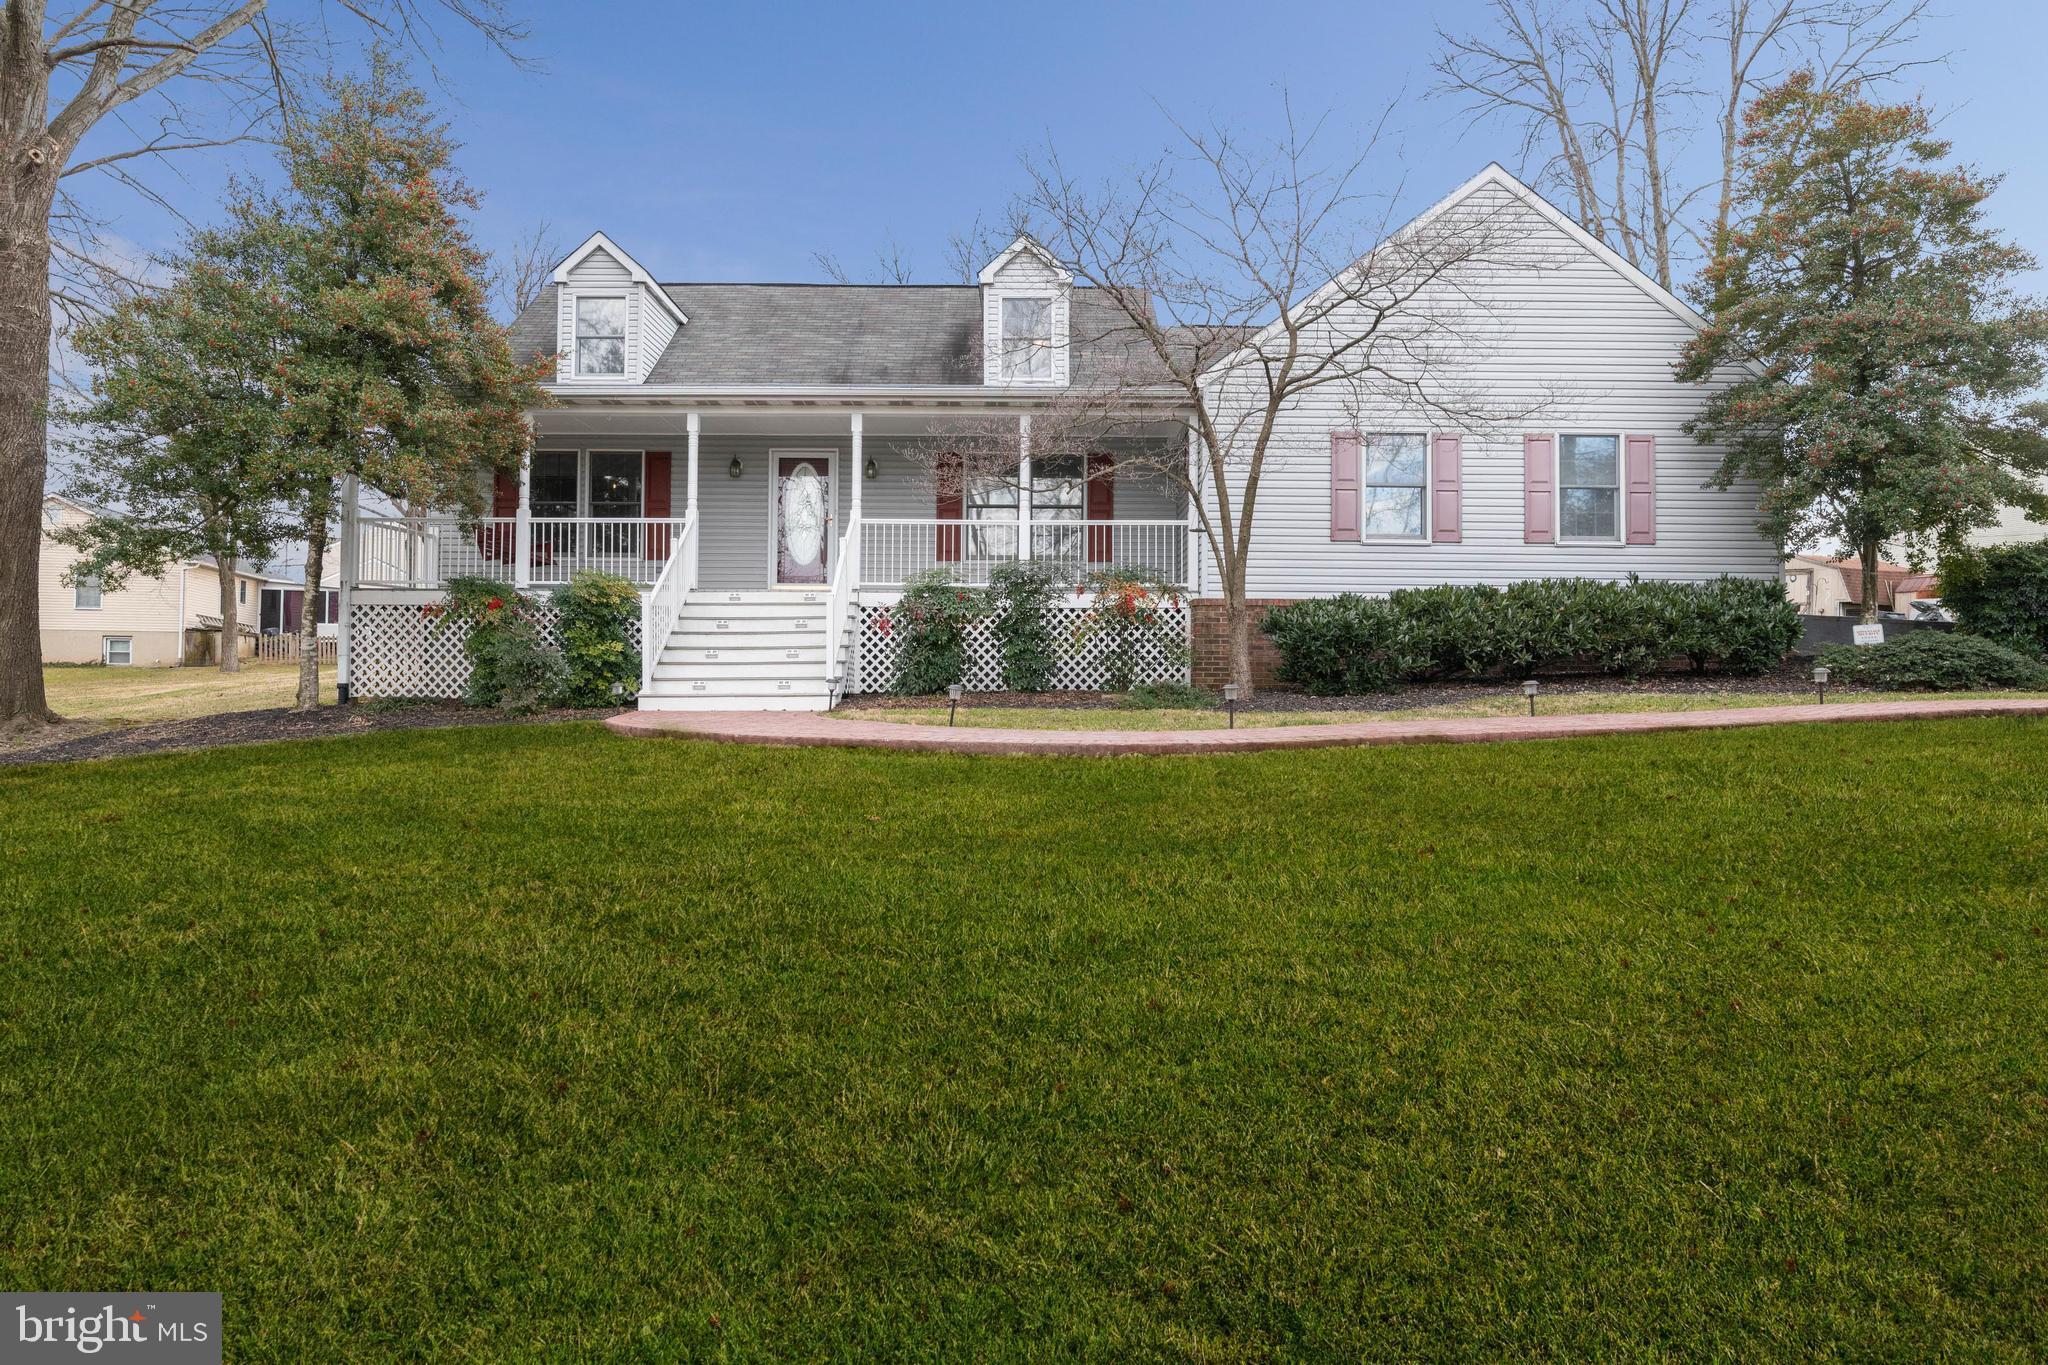 424 Barbersville Rd, Laurel, MD, 20724